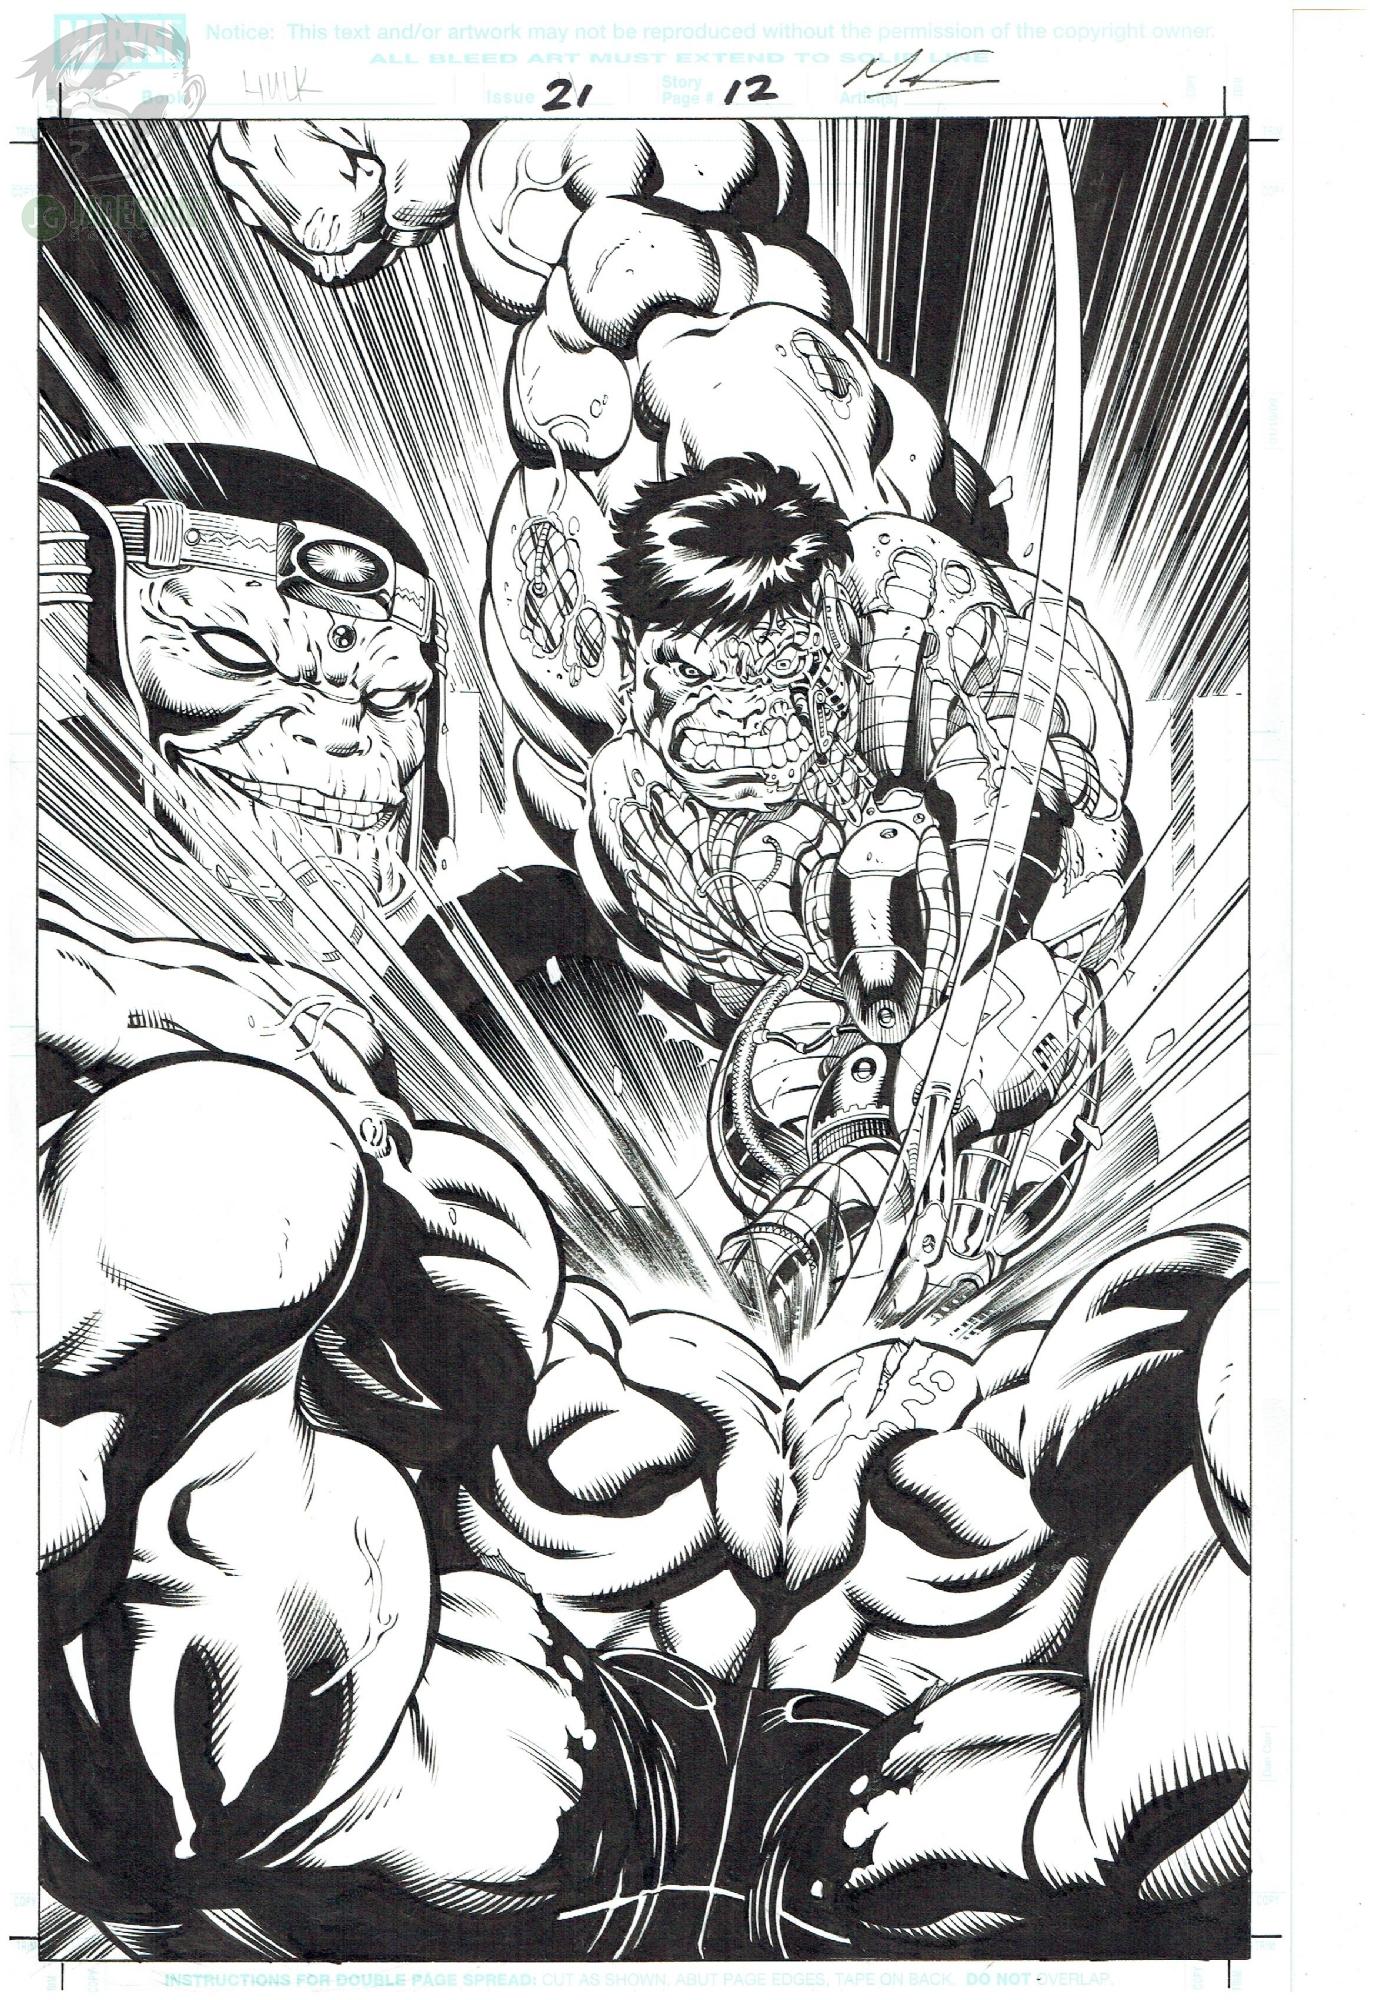 2010 Hulk issue 21 page 12 Cosmic Hulk vs Ross Red Hulk by Ed McGuinness Comic Art